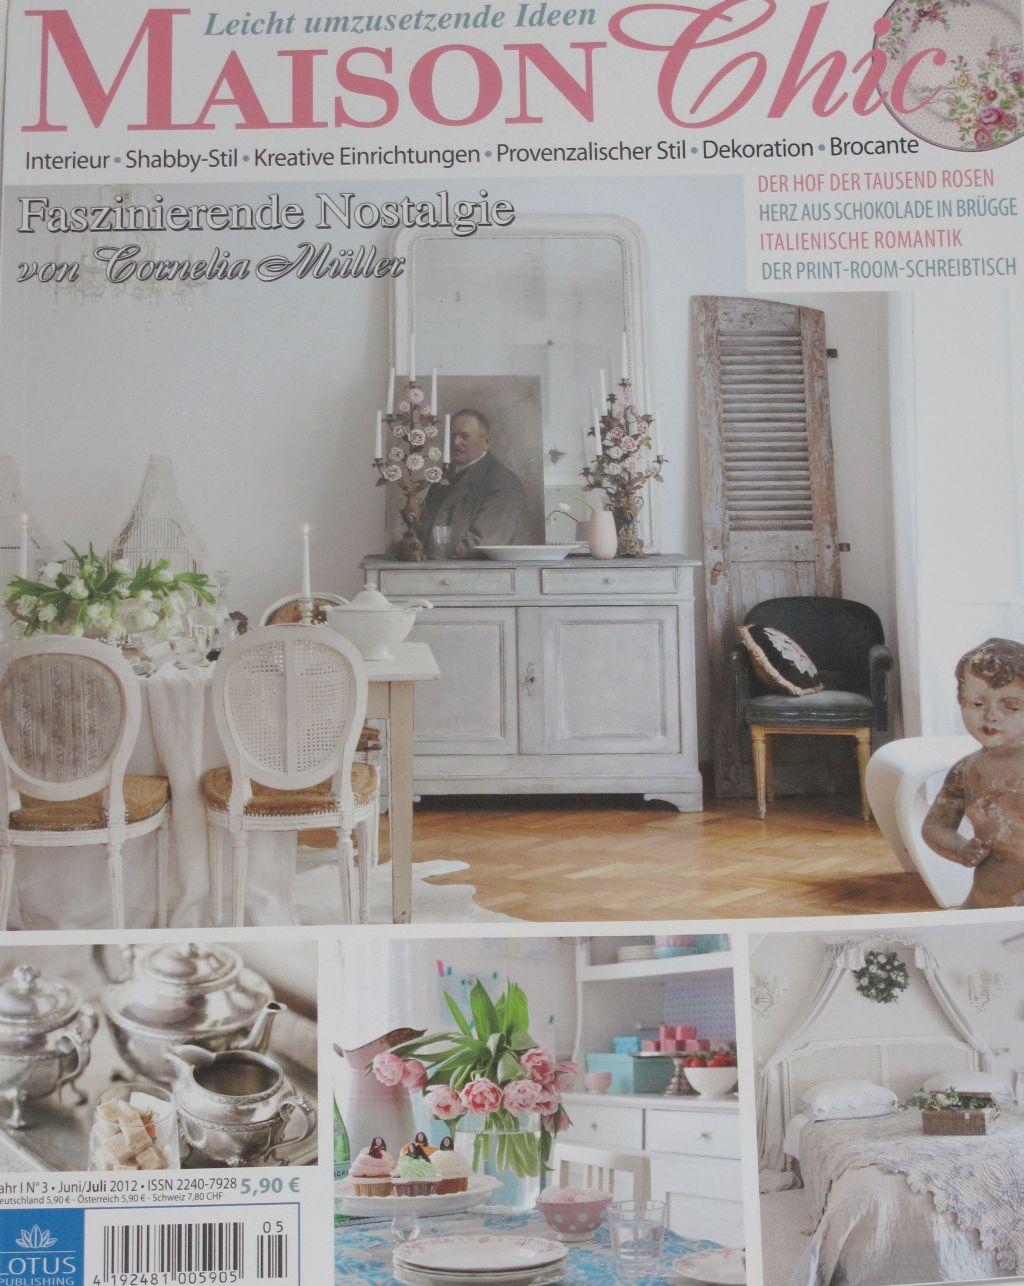 Magazine maison chic magazine maison chic with magazine maison chic camille - Maison chic magazine ...